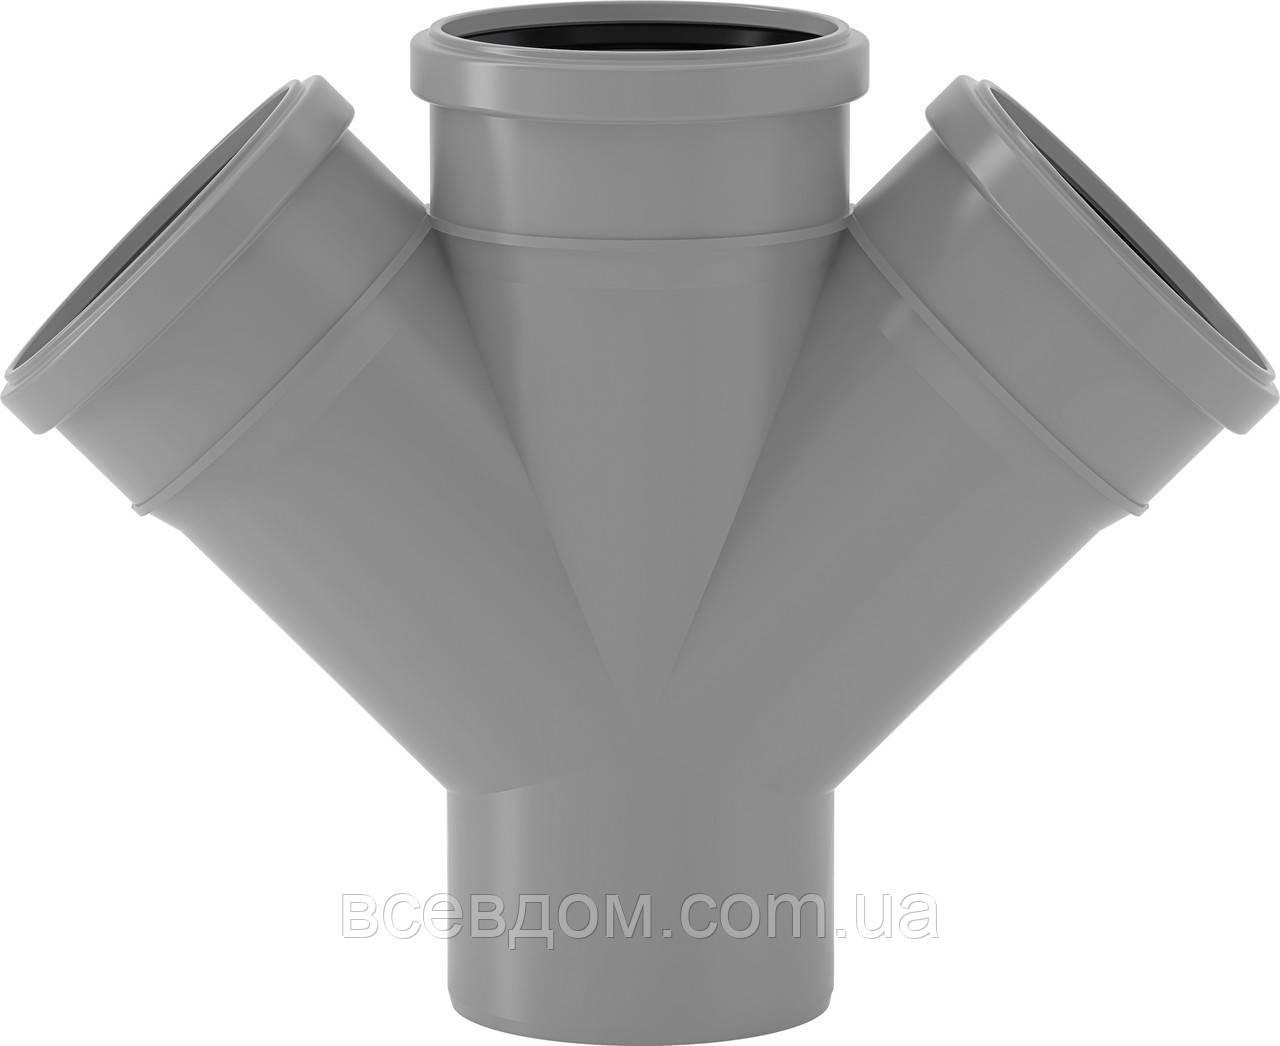 HDTA крестовина Valsir внутренней канализации 110/50/50х67°